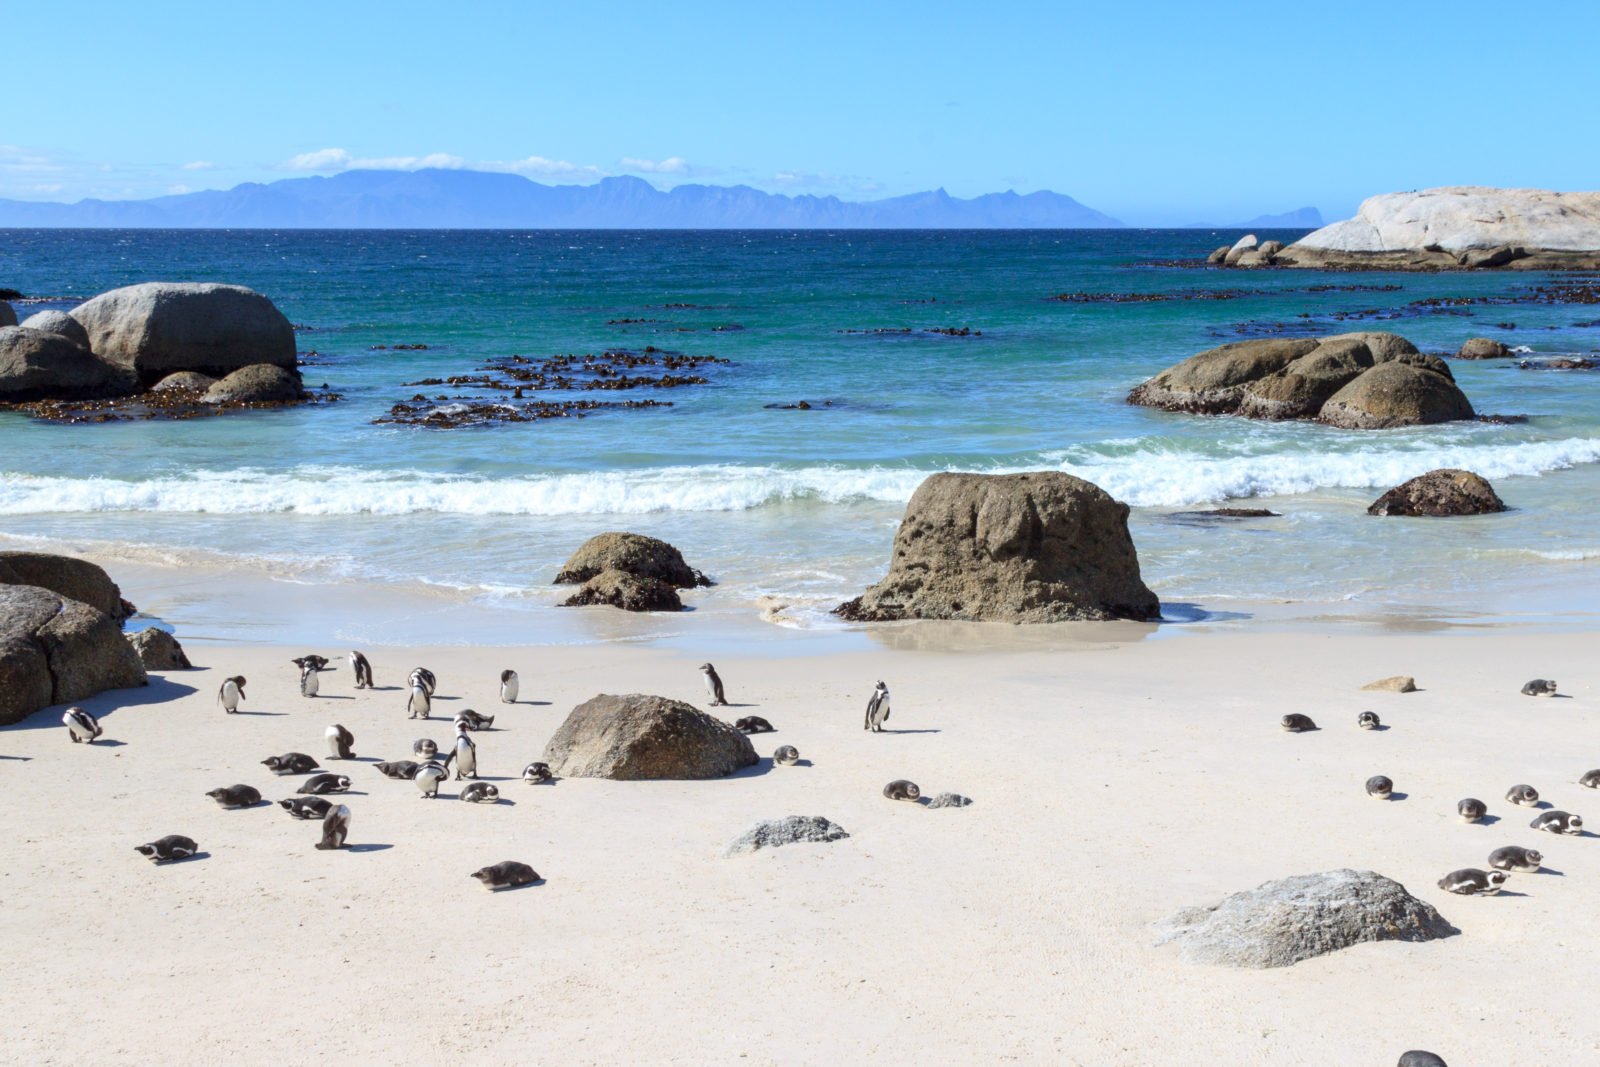 Boulders-beach-pinguini